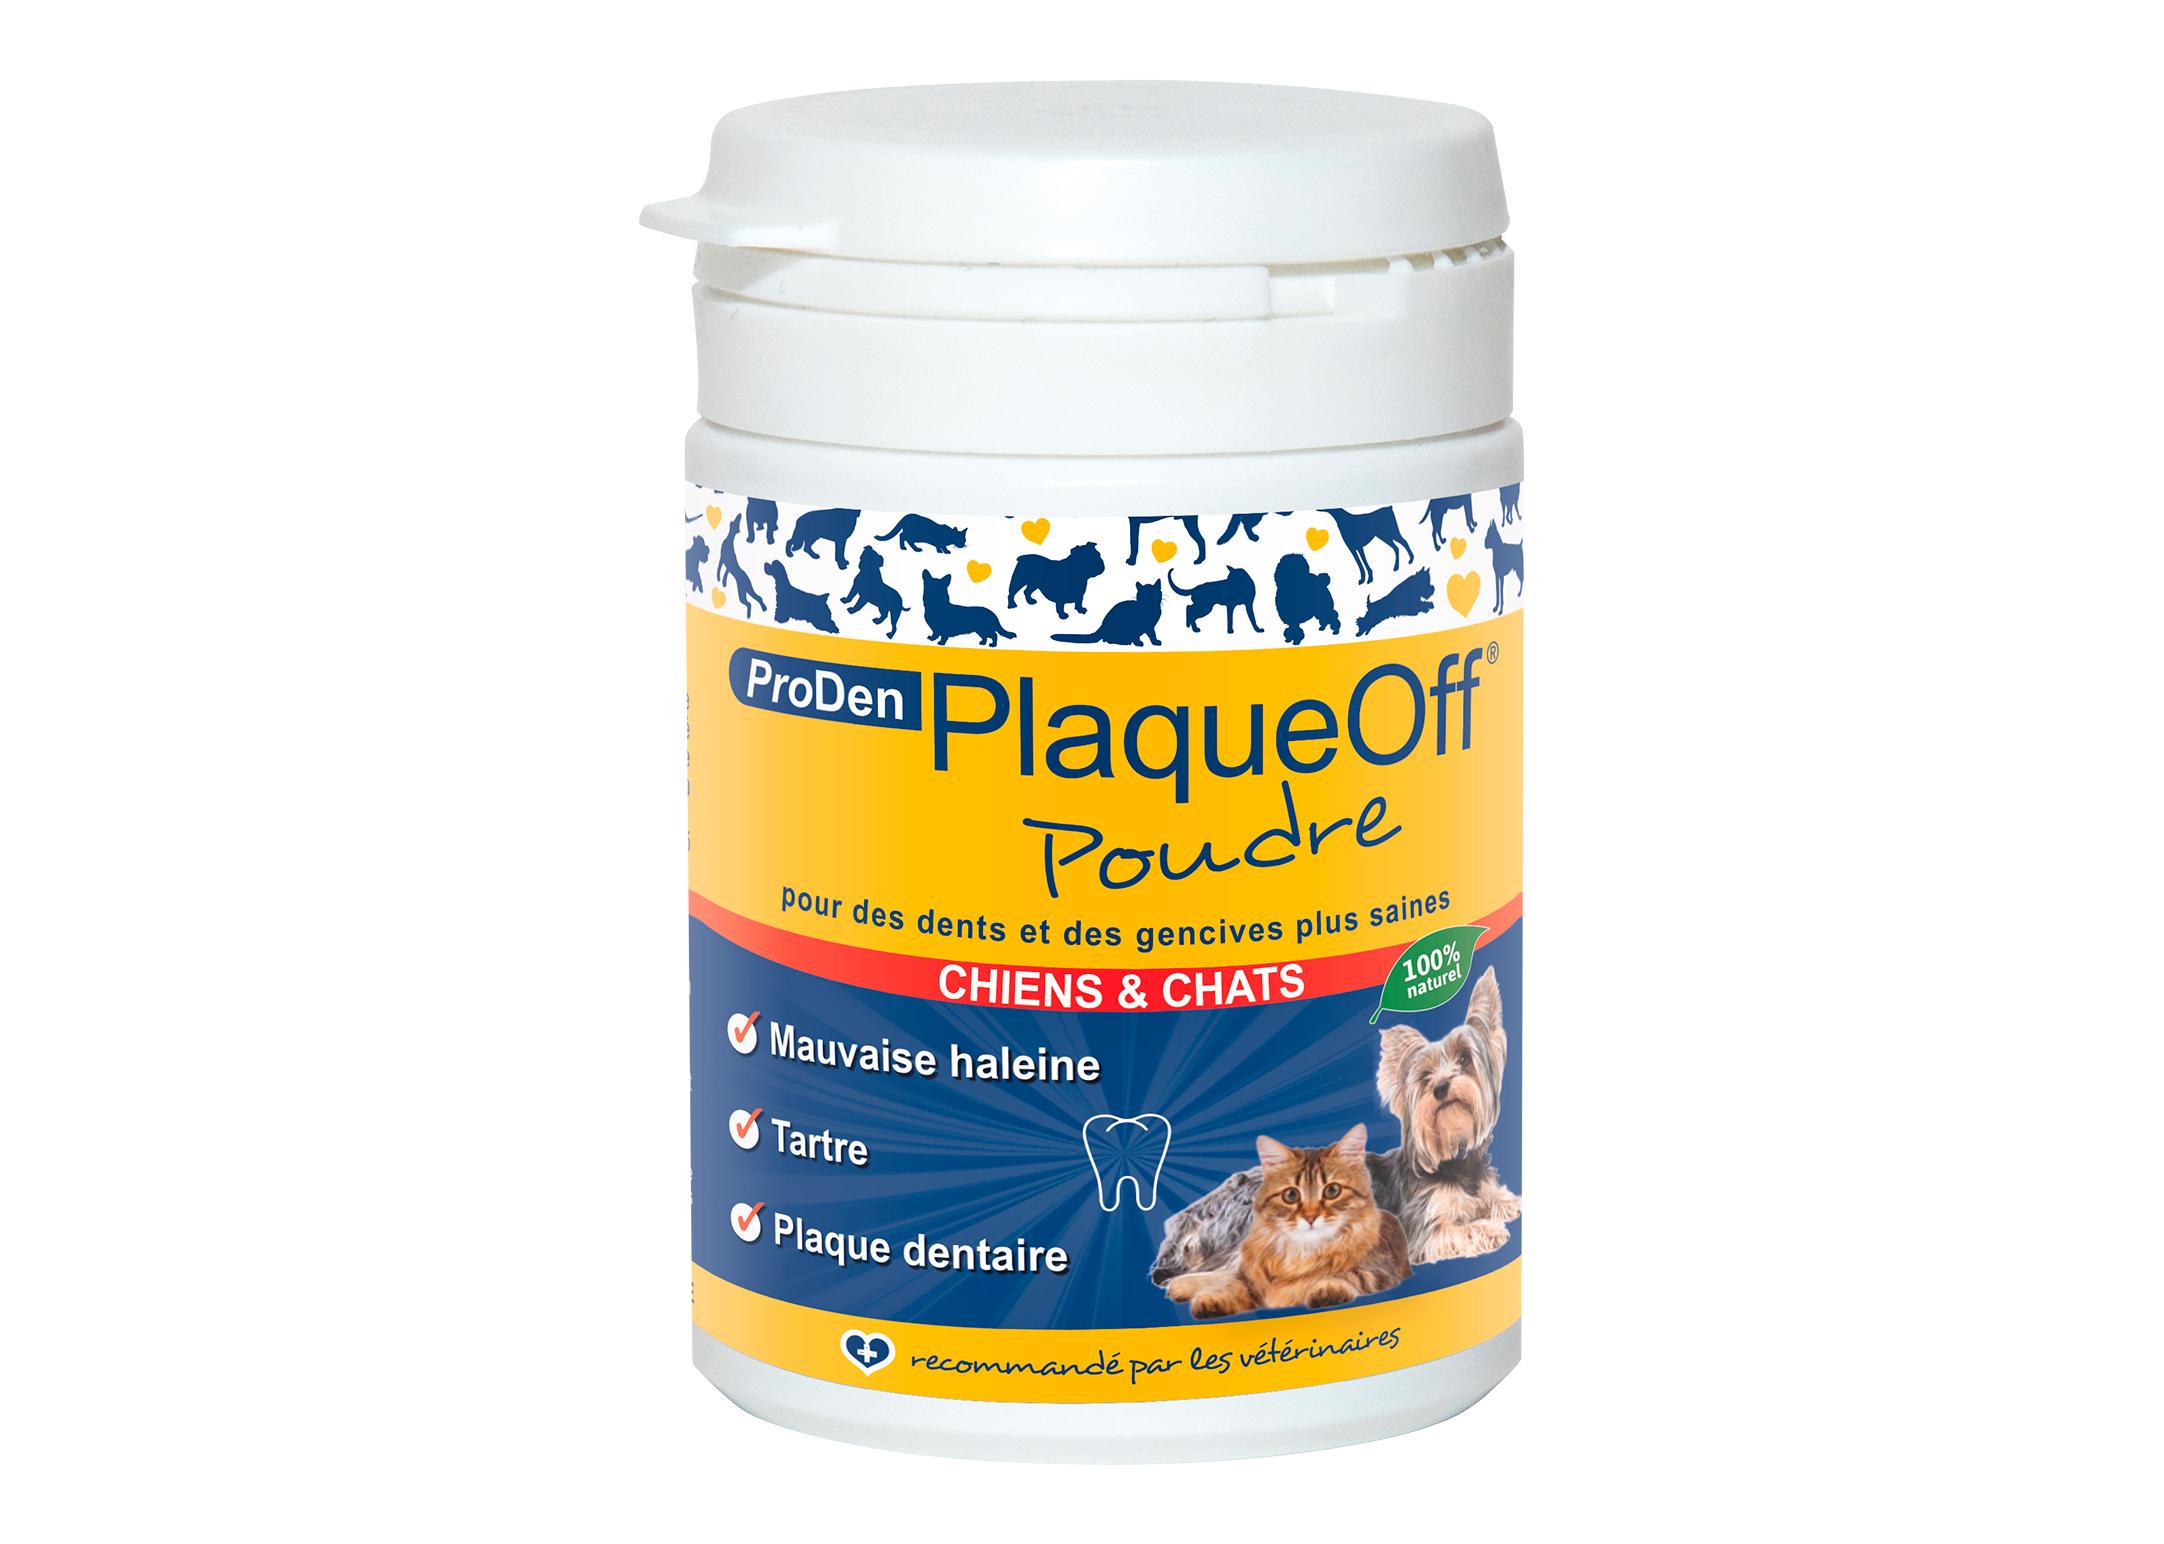 PlaqueOff Powder 40gr Teeth Cleaning Product